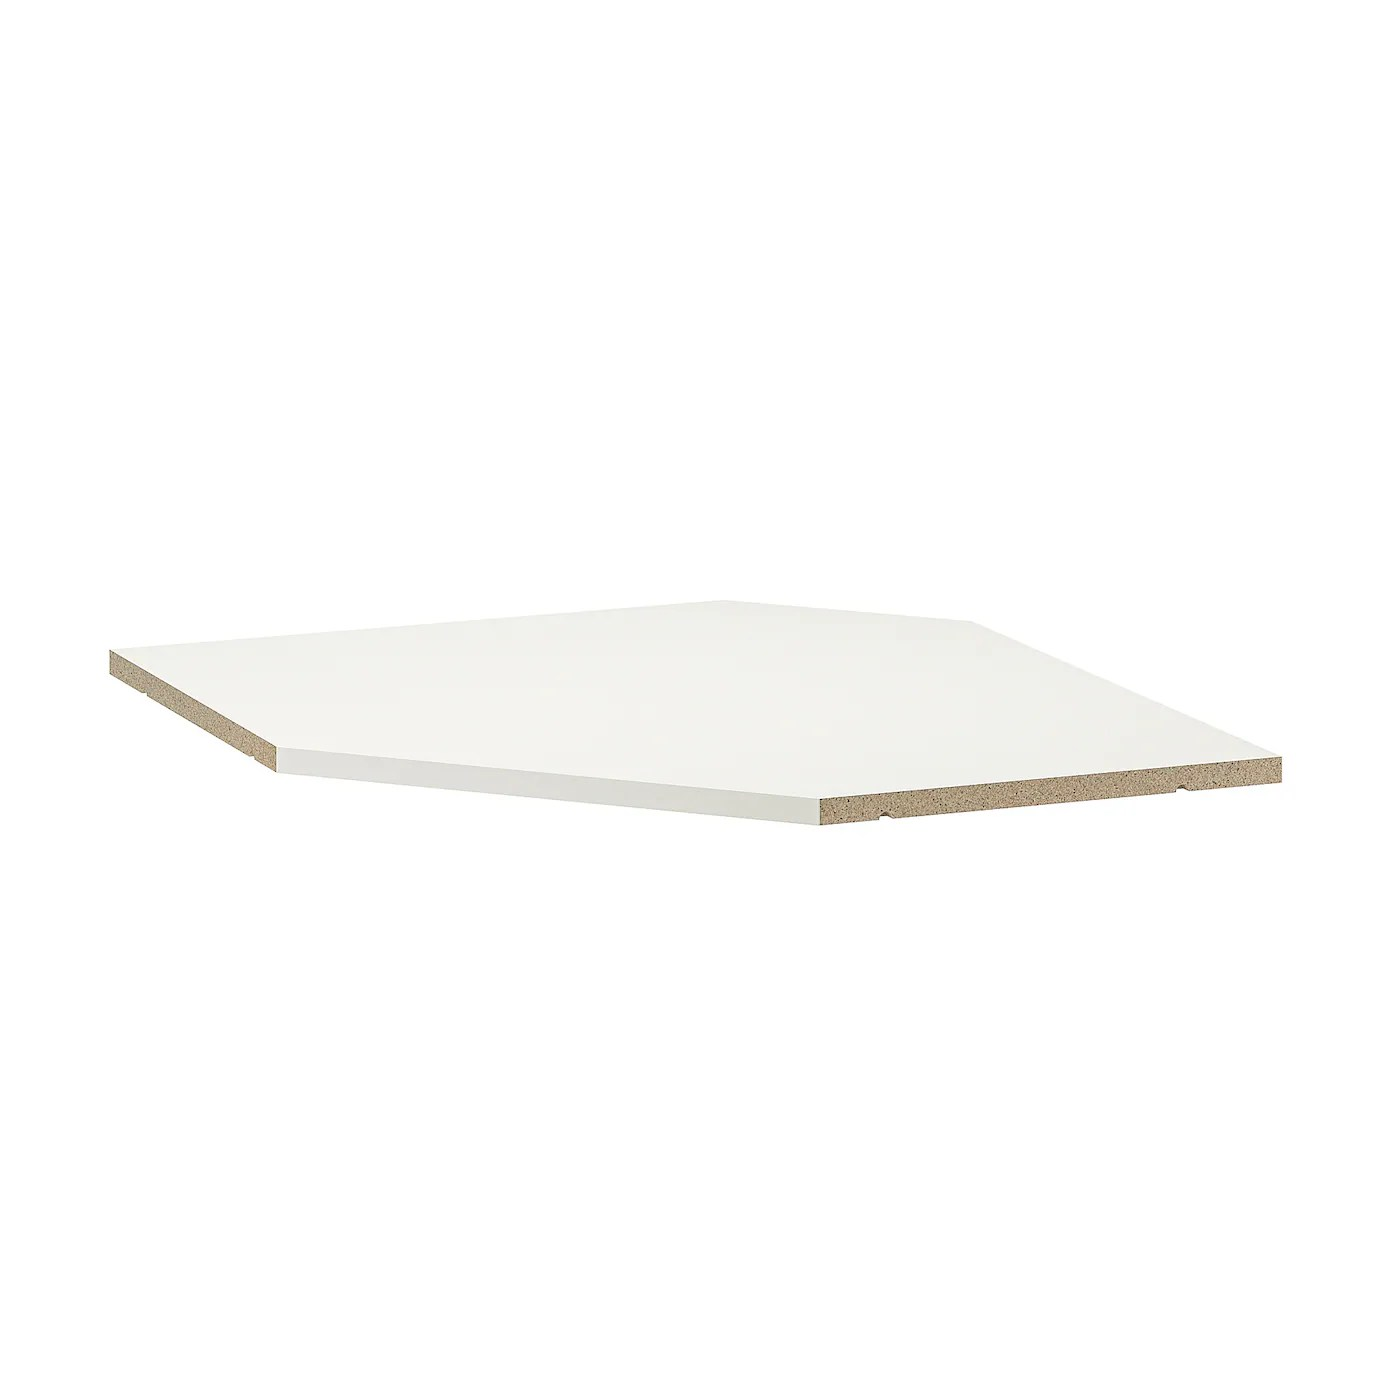 utrusta tablette element mural d angle blanc 68 cm